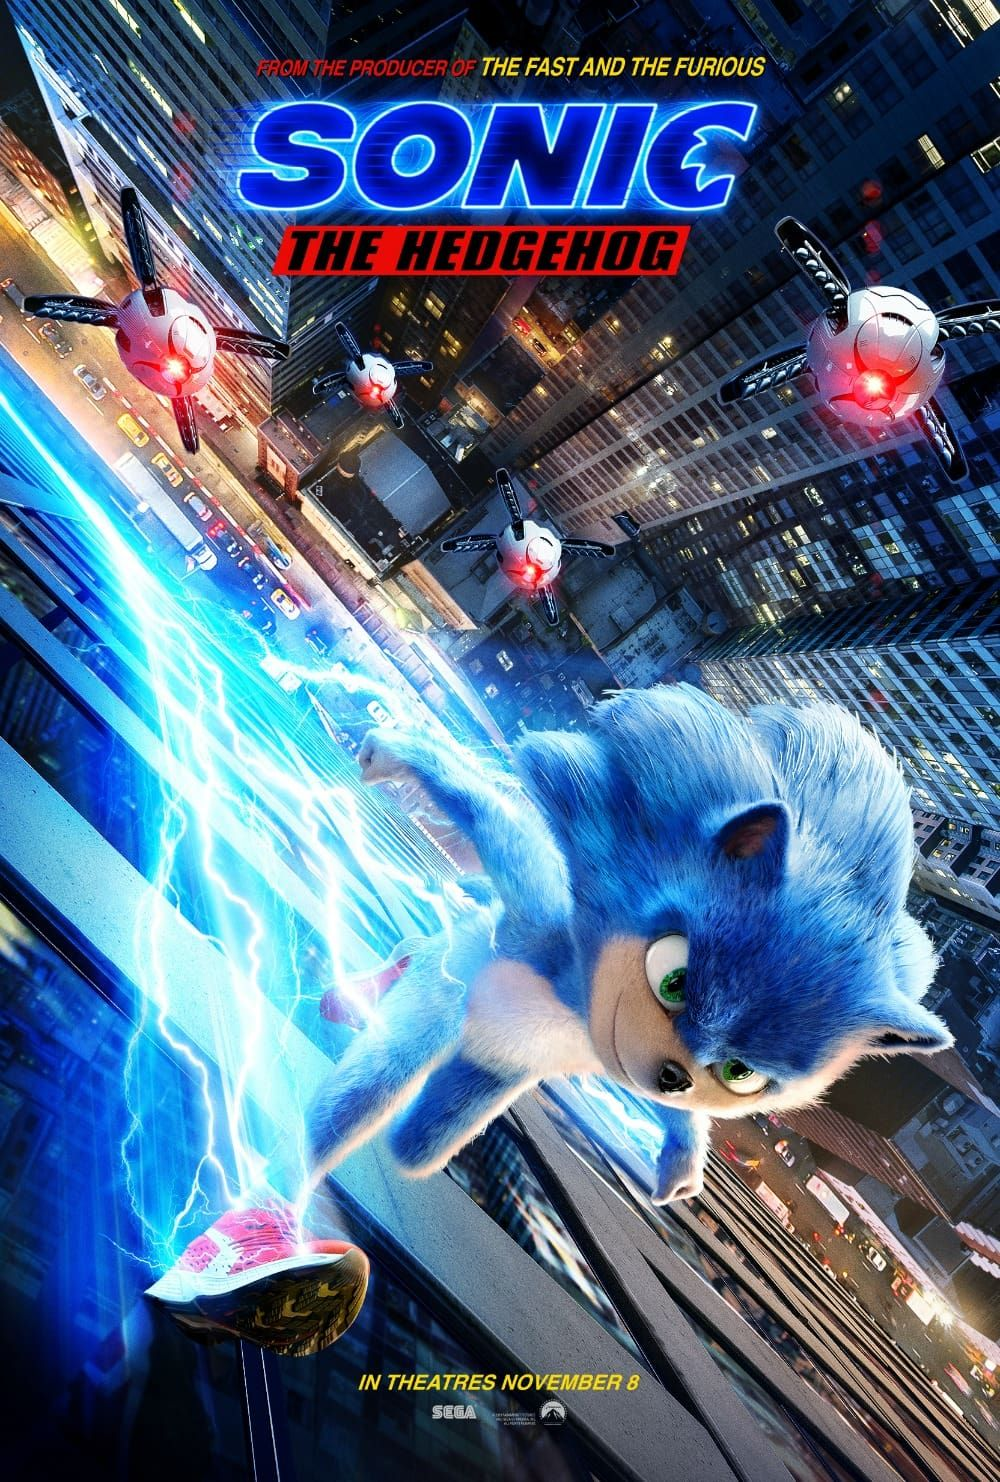 Sonic The Hedgehog Movie Trailer Filme Do Sonic Filmes Sonic